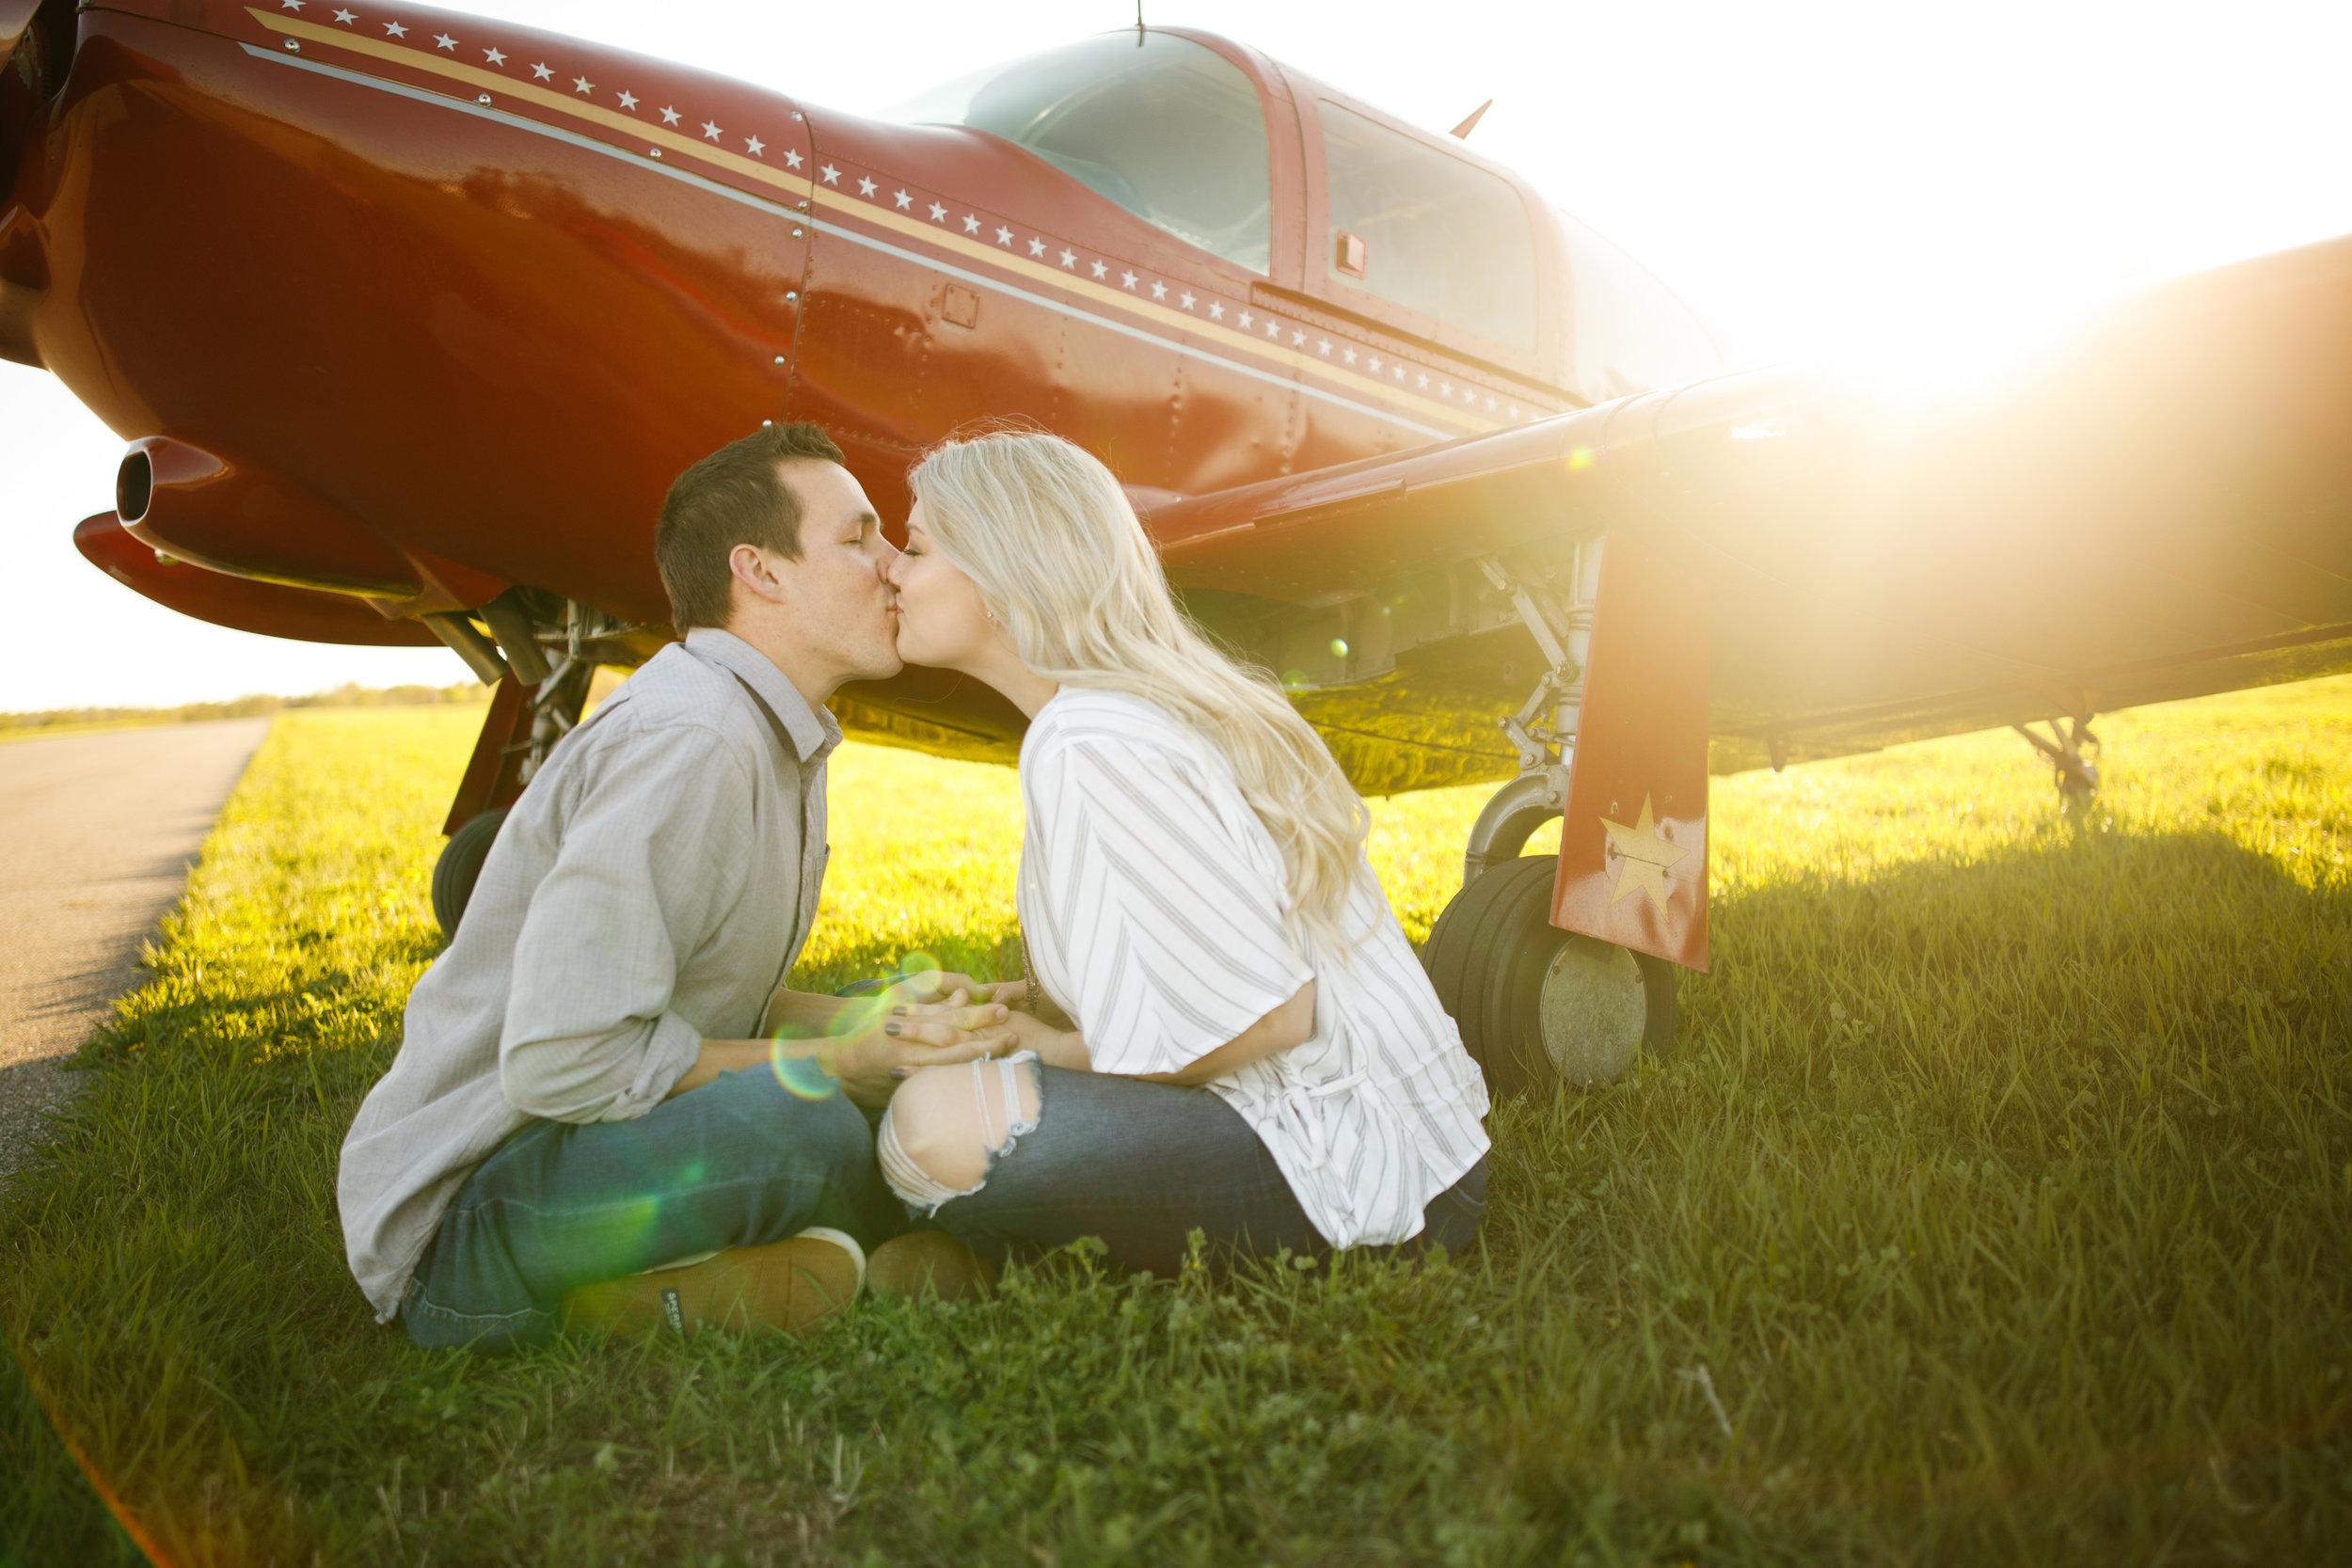 Grand Rapids Photographer - J Darling Photo - jessica darling - grand rapids wedding photographer - sparta airport - sparta michigan - jasmine and jeff engaged 030.jpg